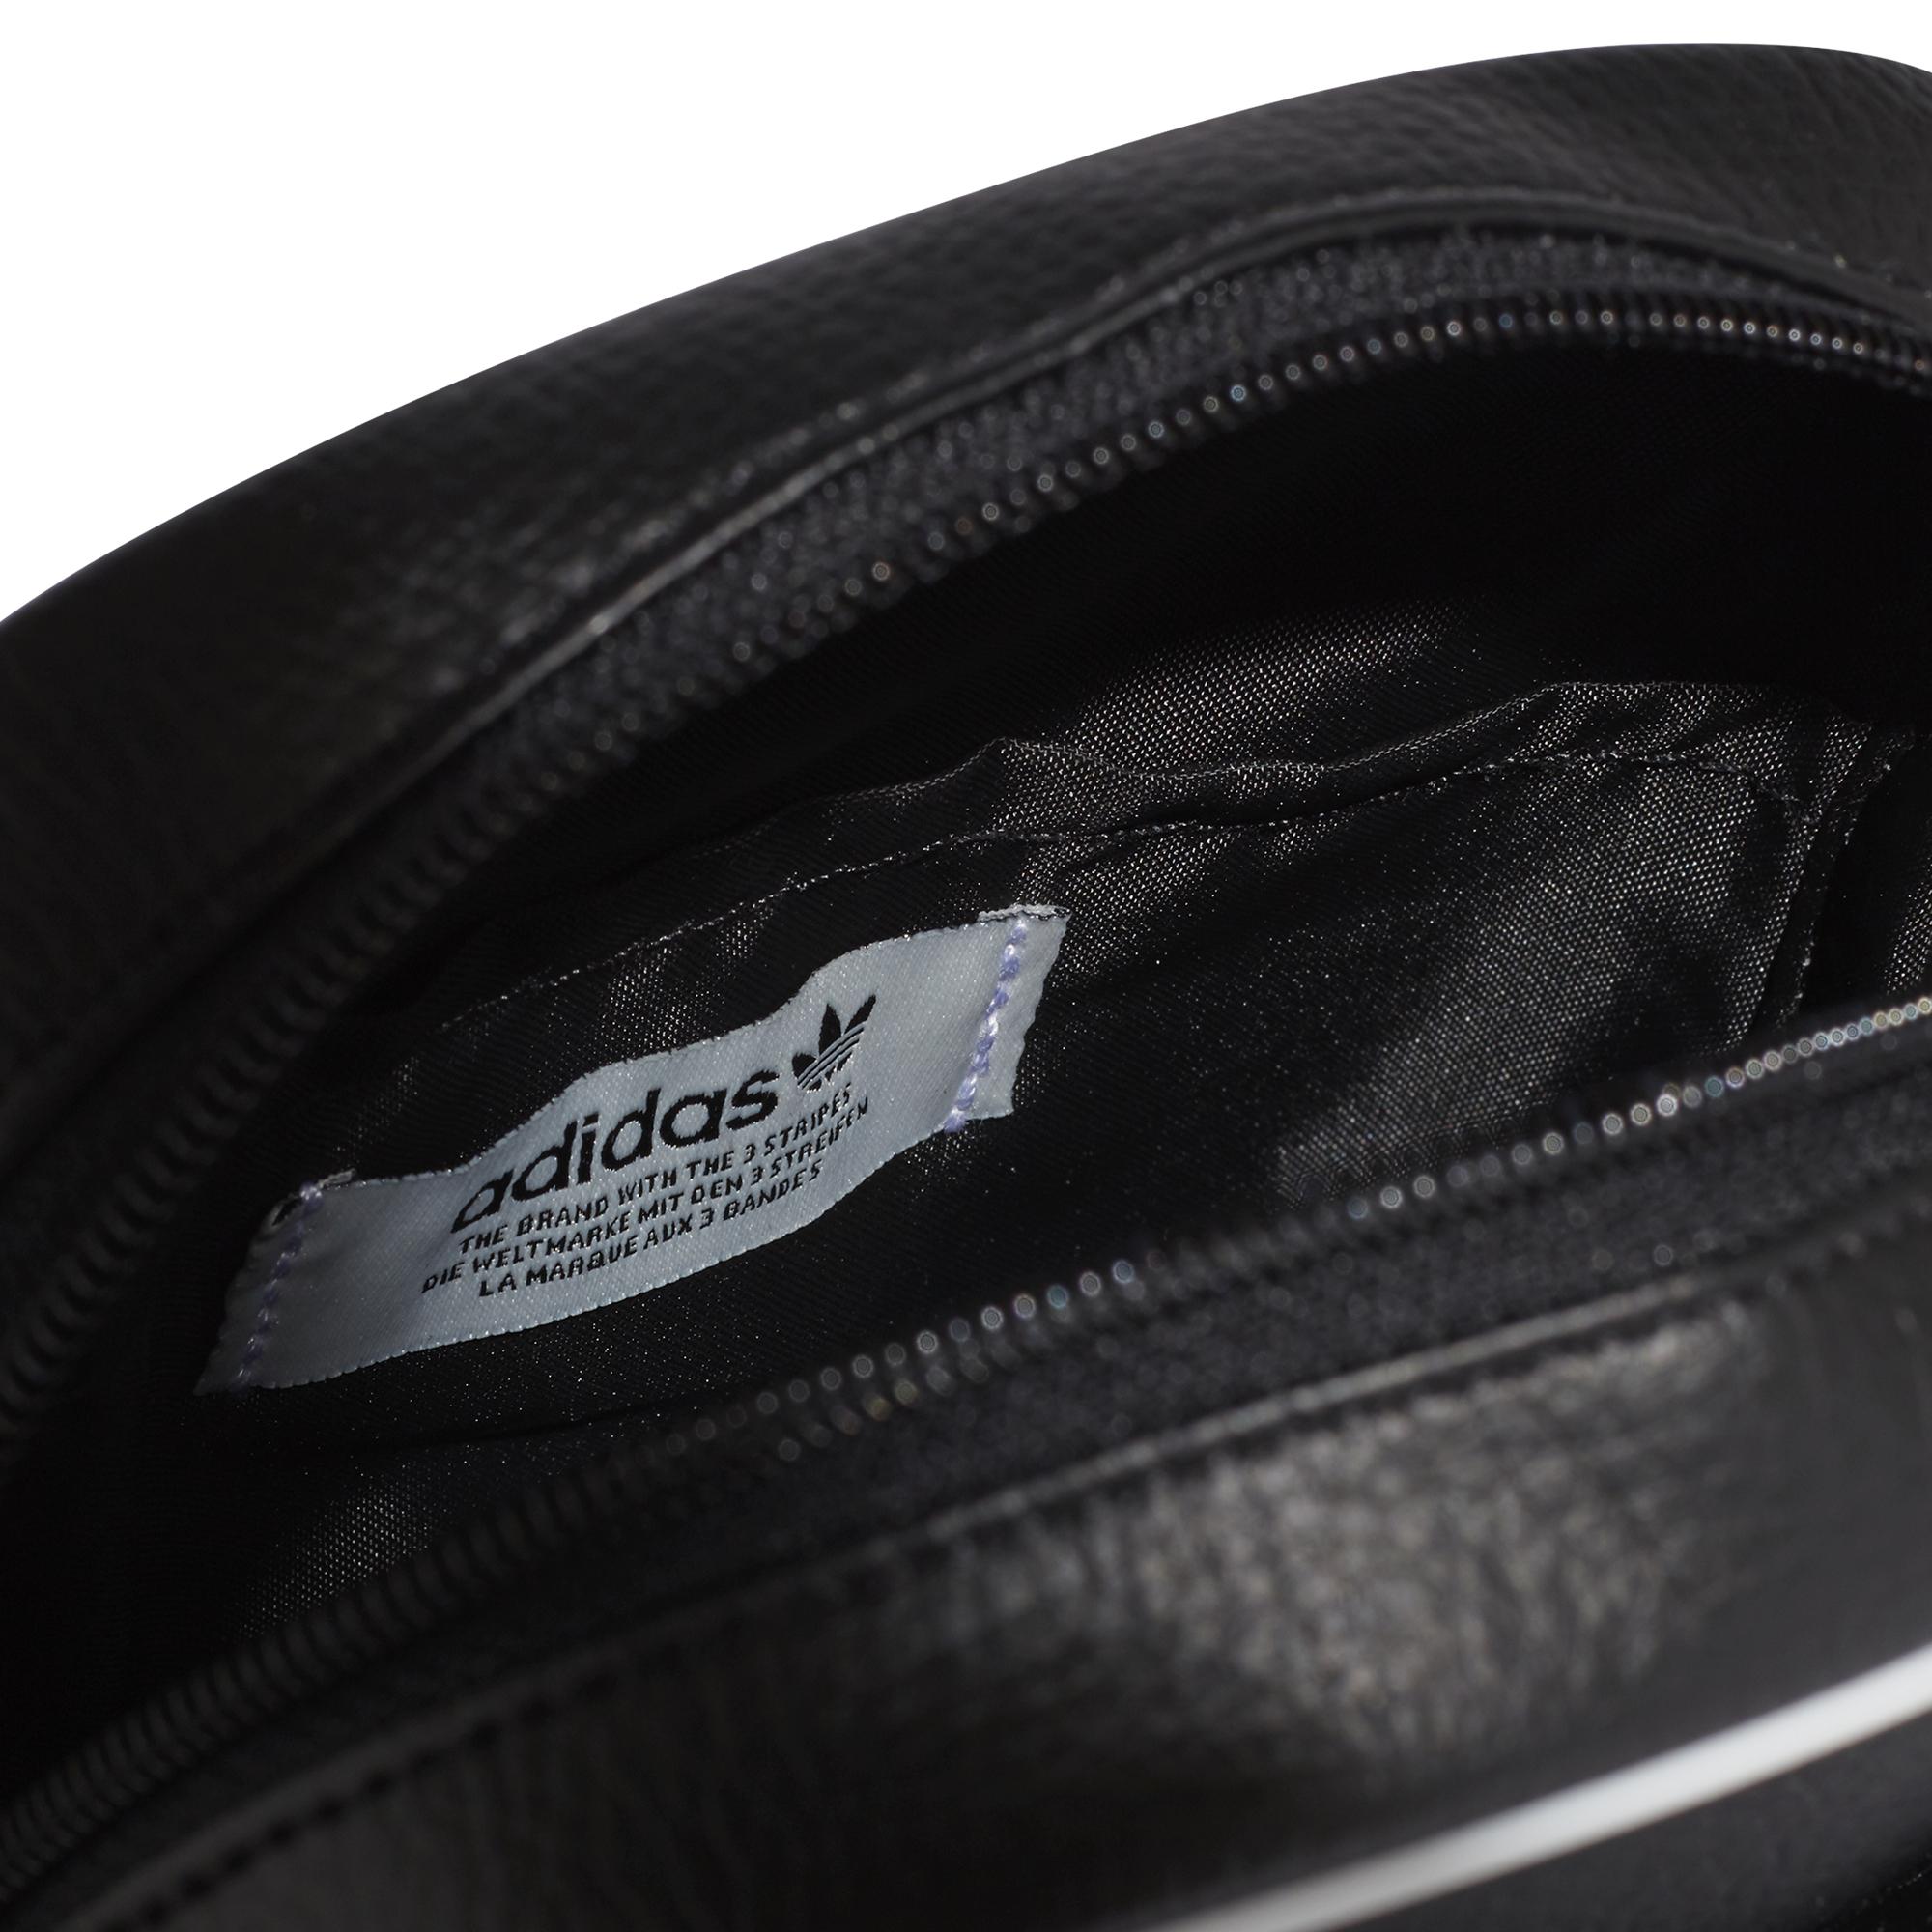 emocional Crítico salud  torebka adidas Mini Vintage DH1006    timsport.pl - dodatkowe zniżki, super  ceny